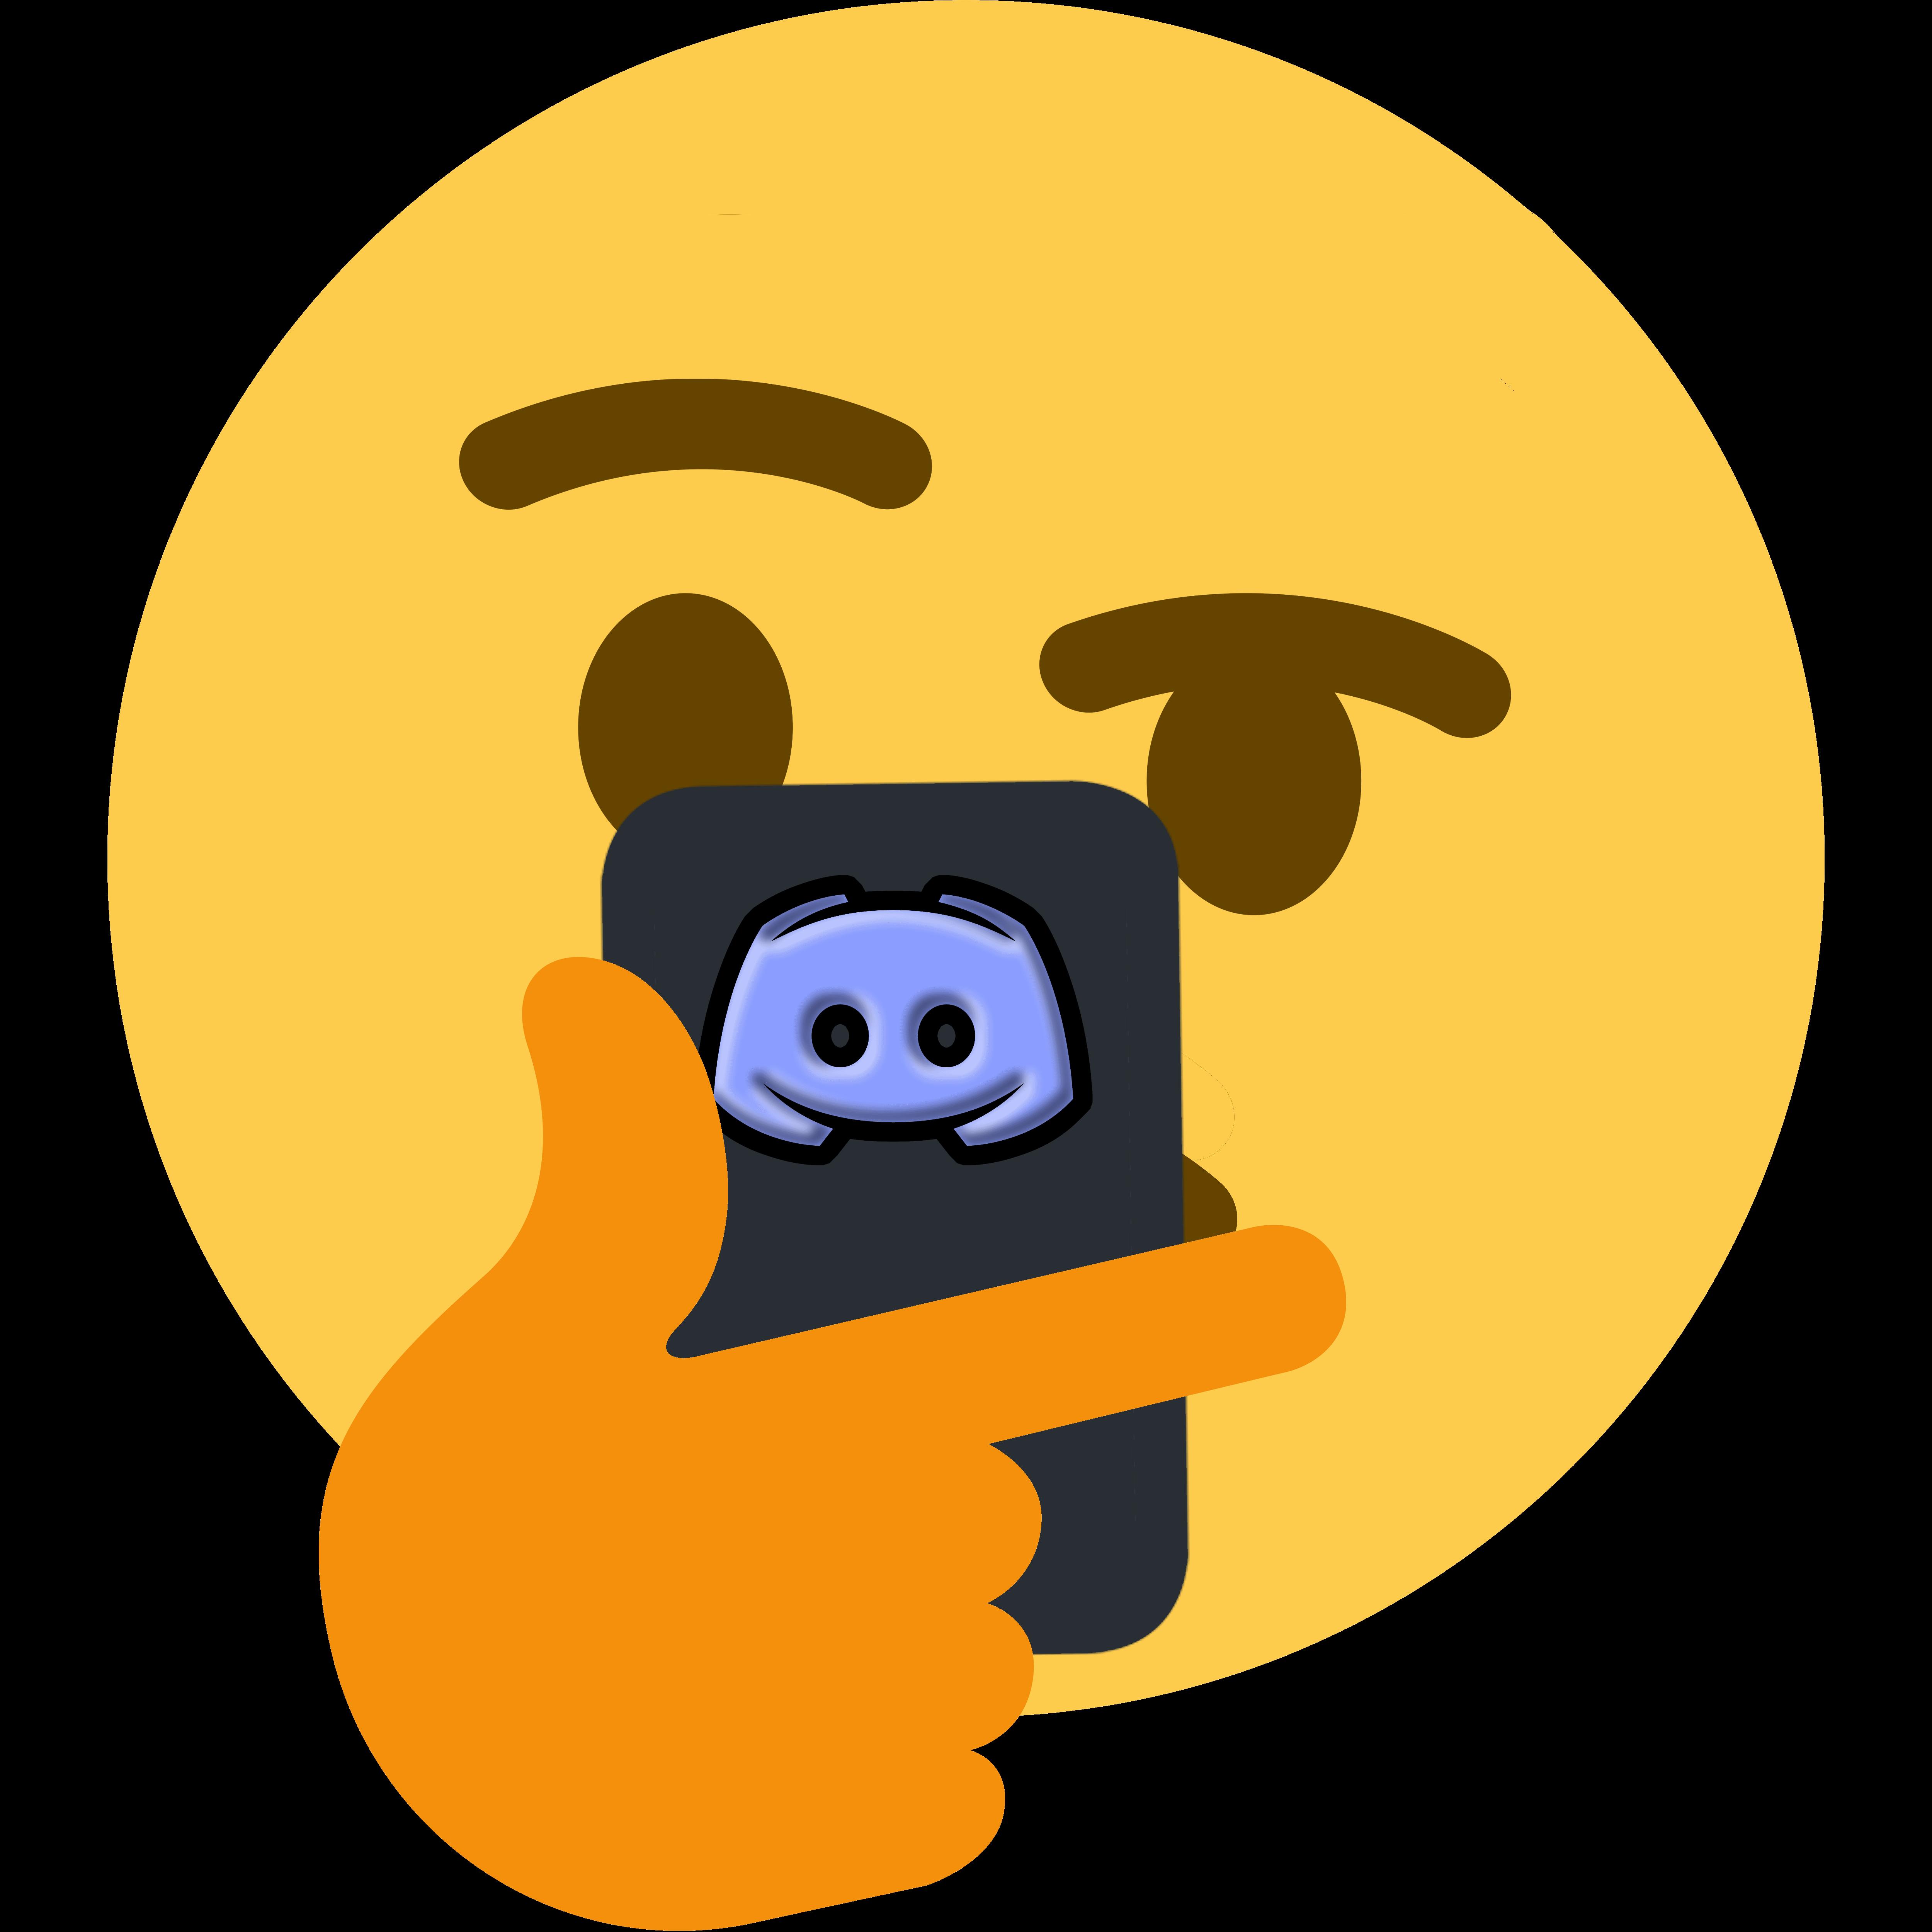 lookingatphone discord emoji